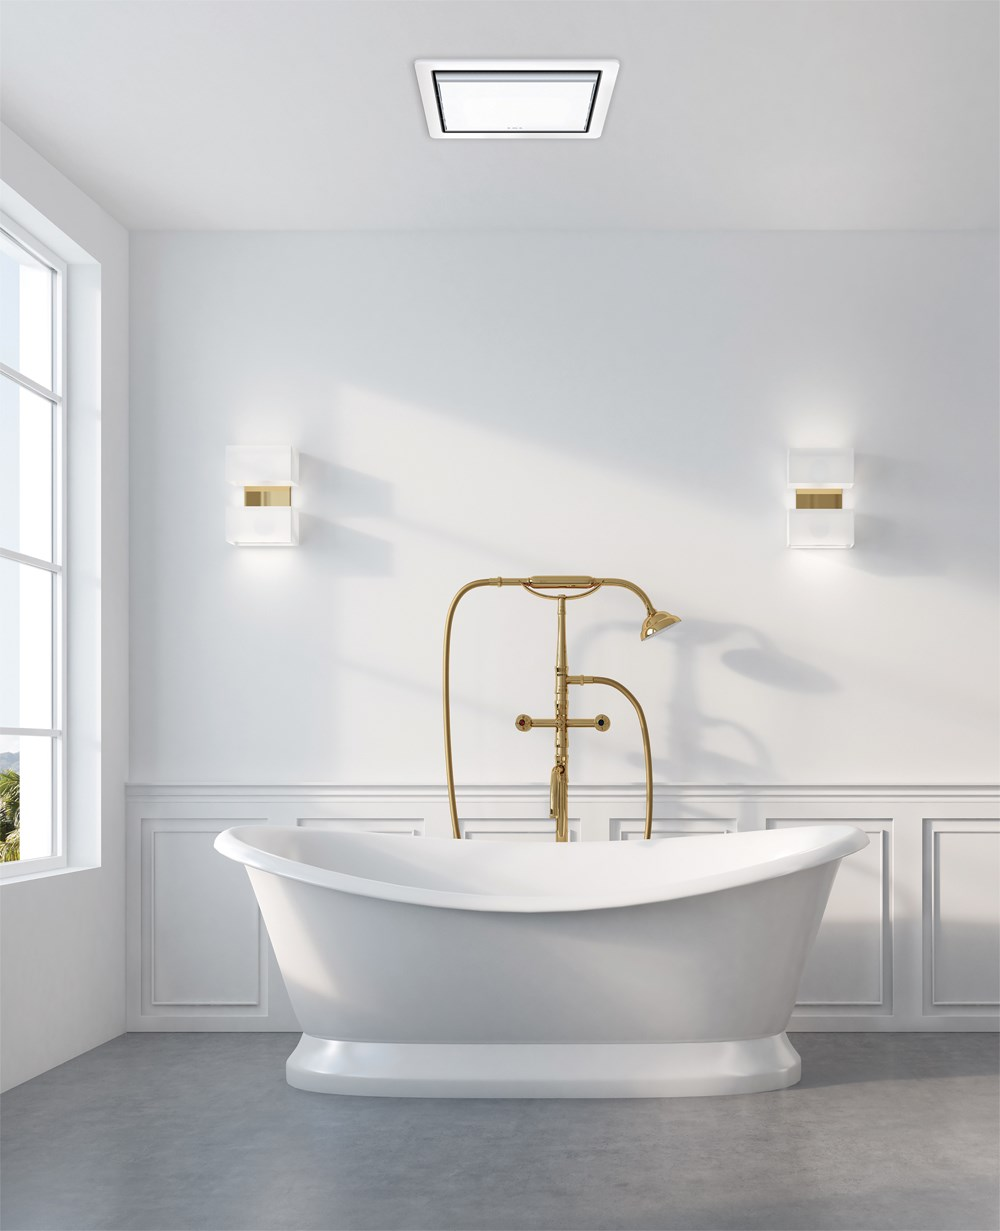 A renovator's guide to bathroom heating & ventilation ...